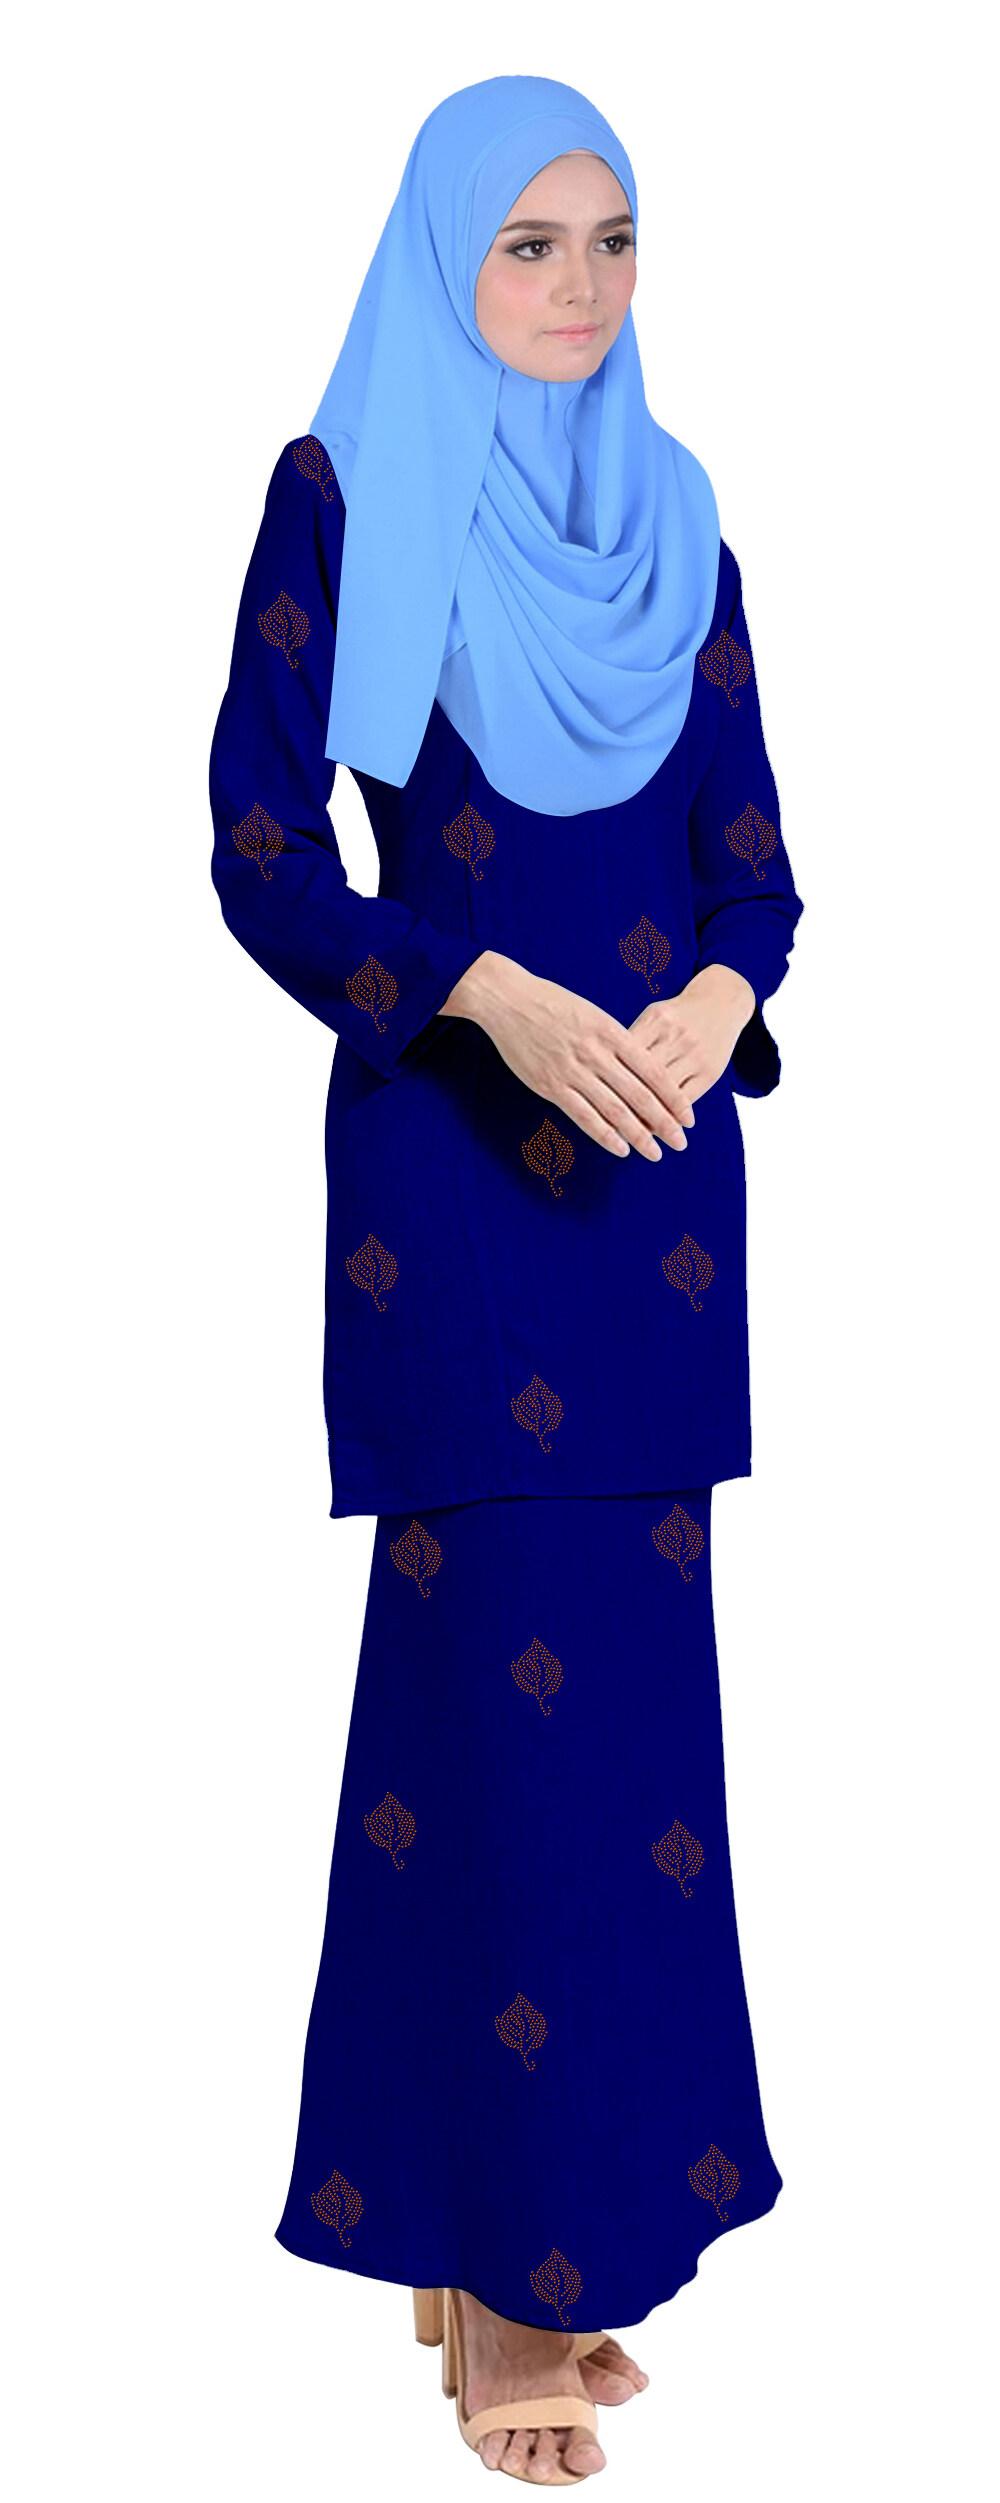 Baju Kurung Tahara For Muslimah Fashoin -Tahara-Navy Blue